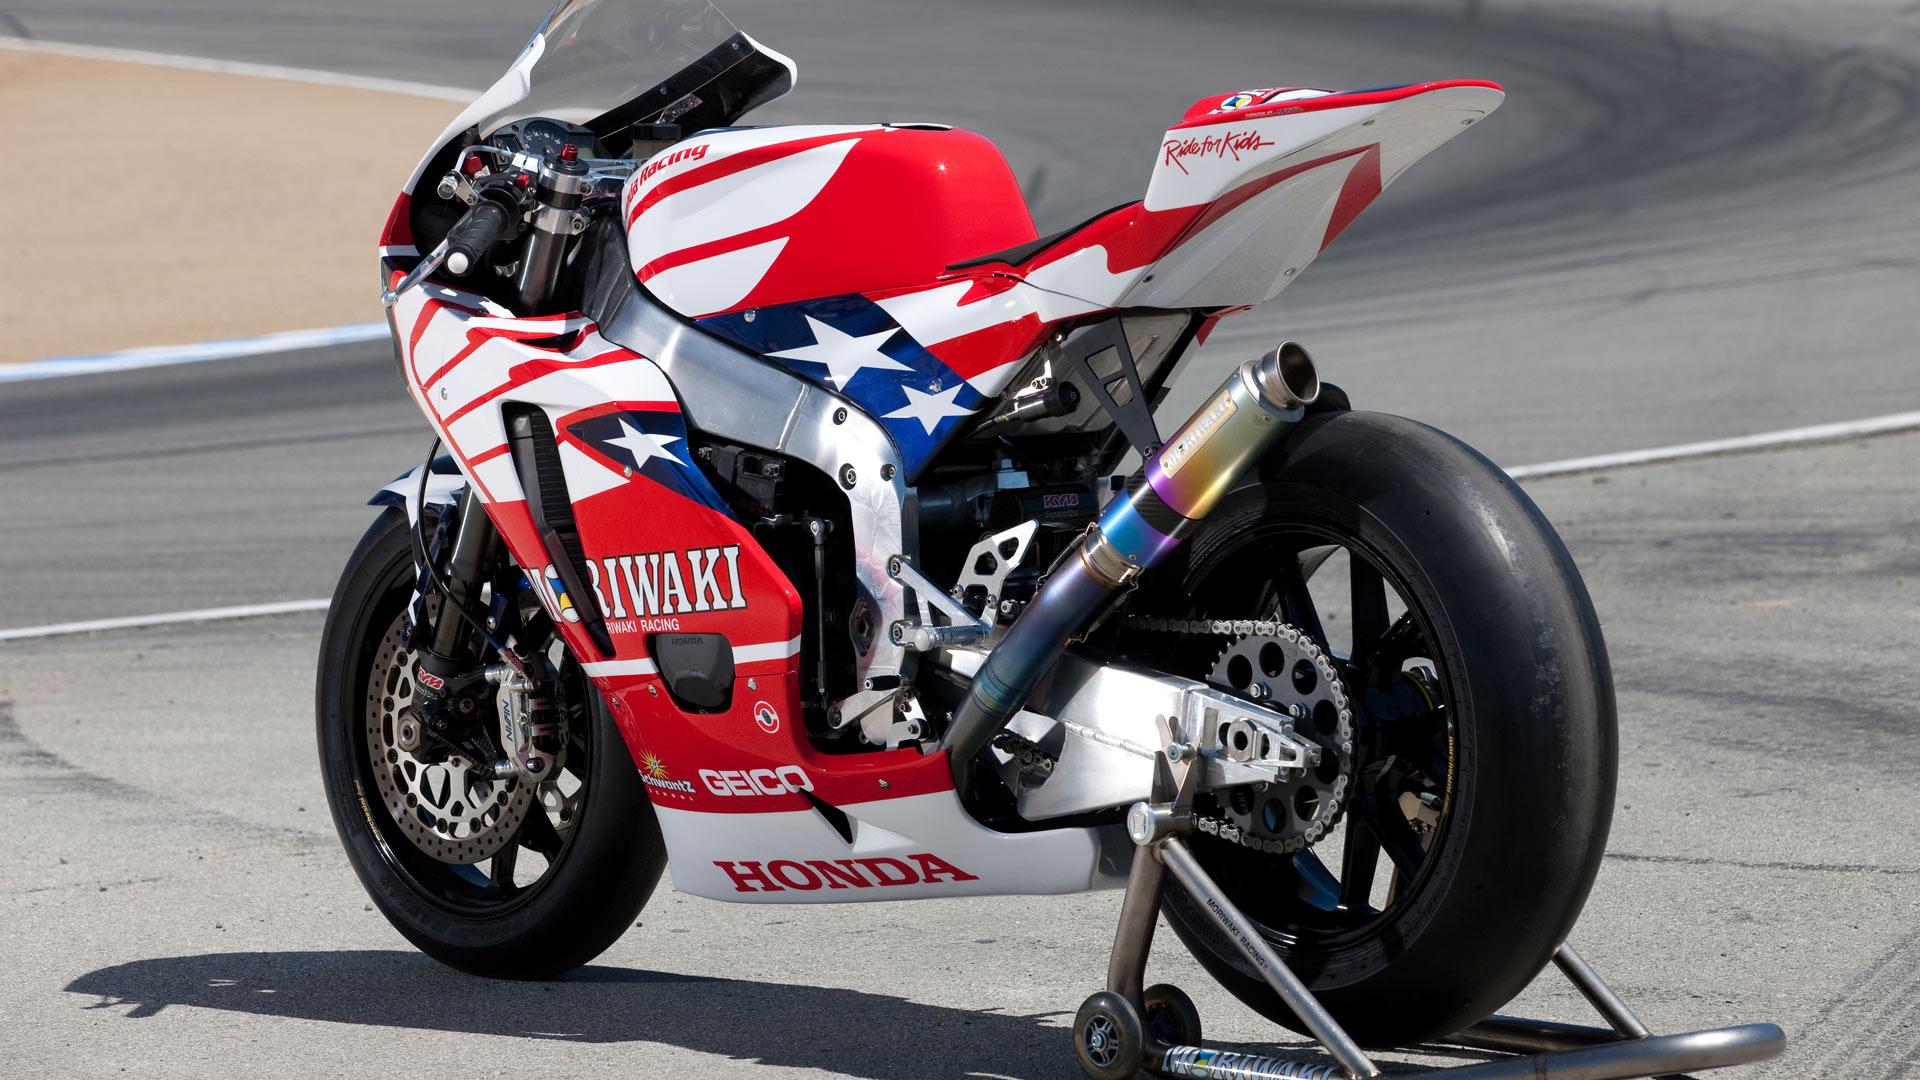 moto gp honda bike usa flag paint 1920x1080